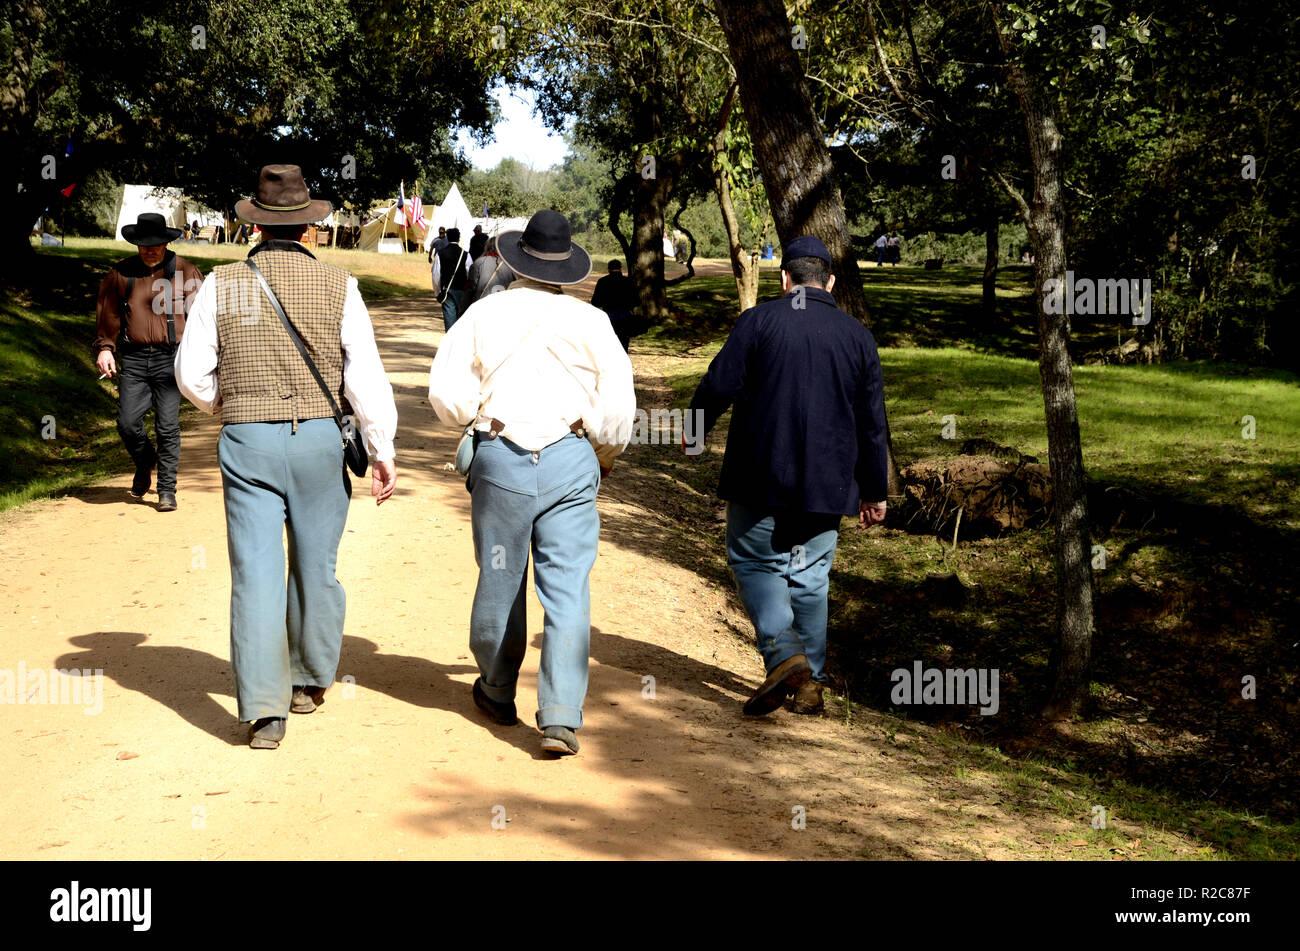 Civil War reenactment actors in a Texas campground